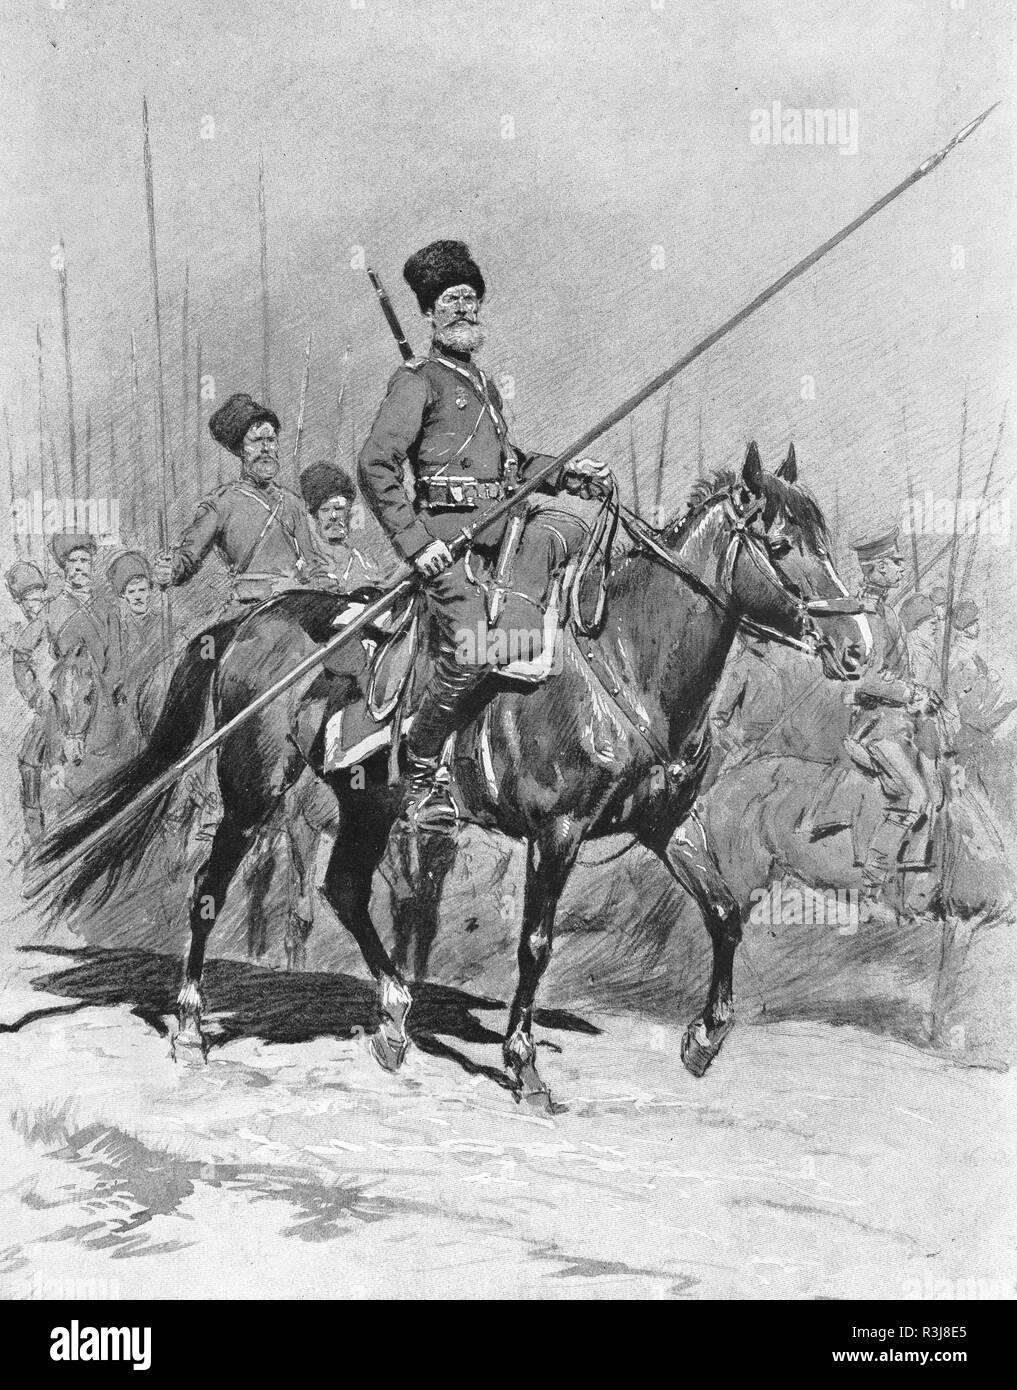 Cossacks cavalry, First World War, Russia - Stock Image